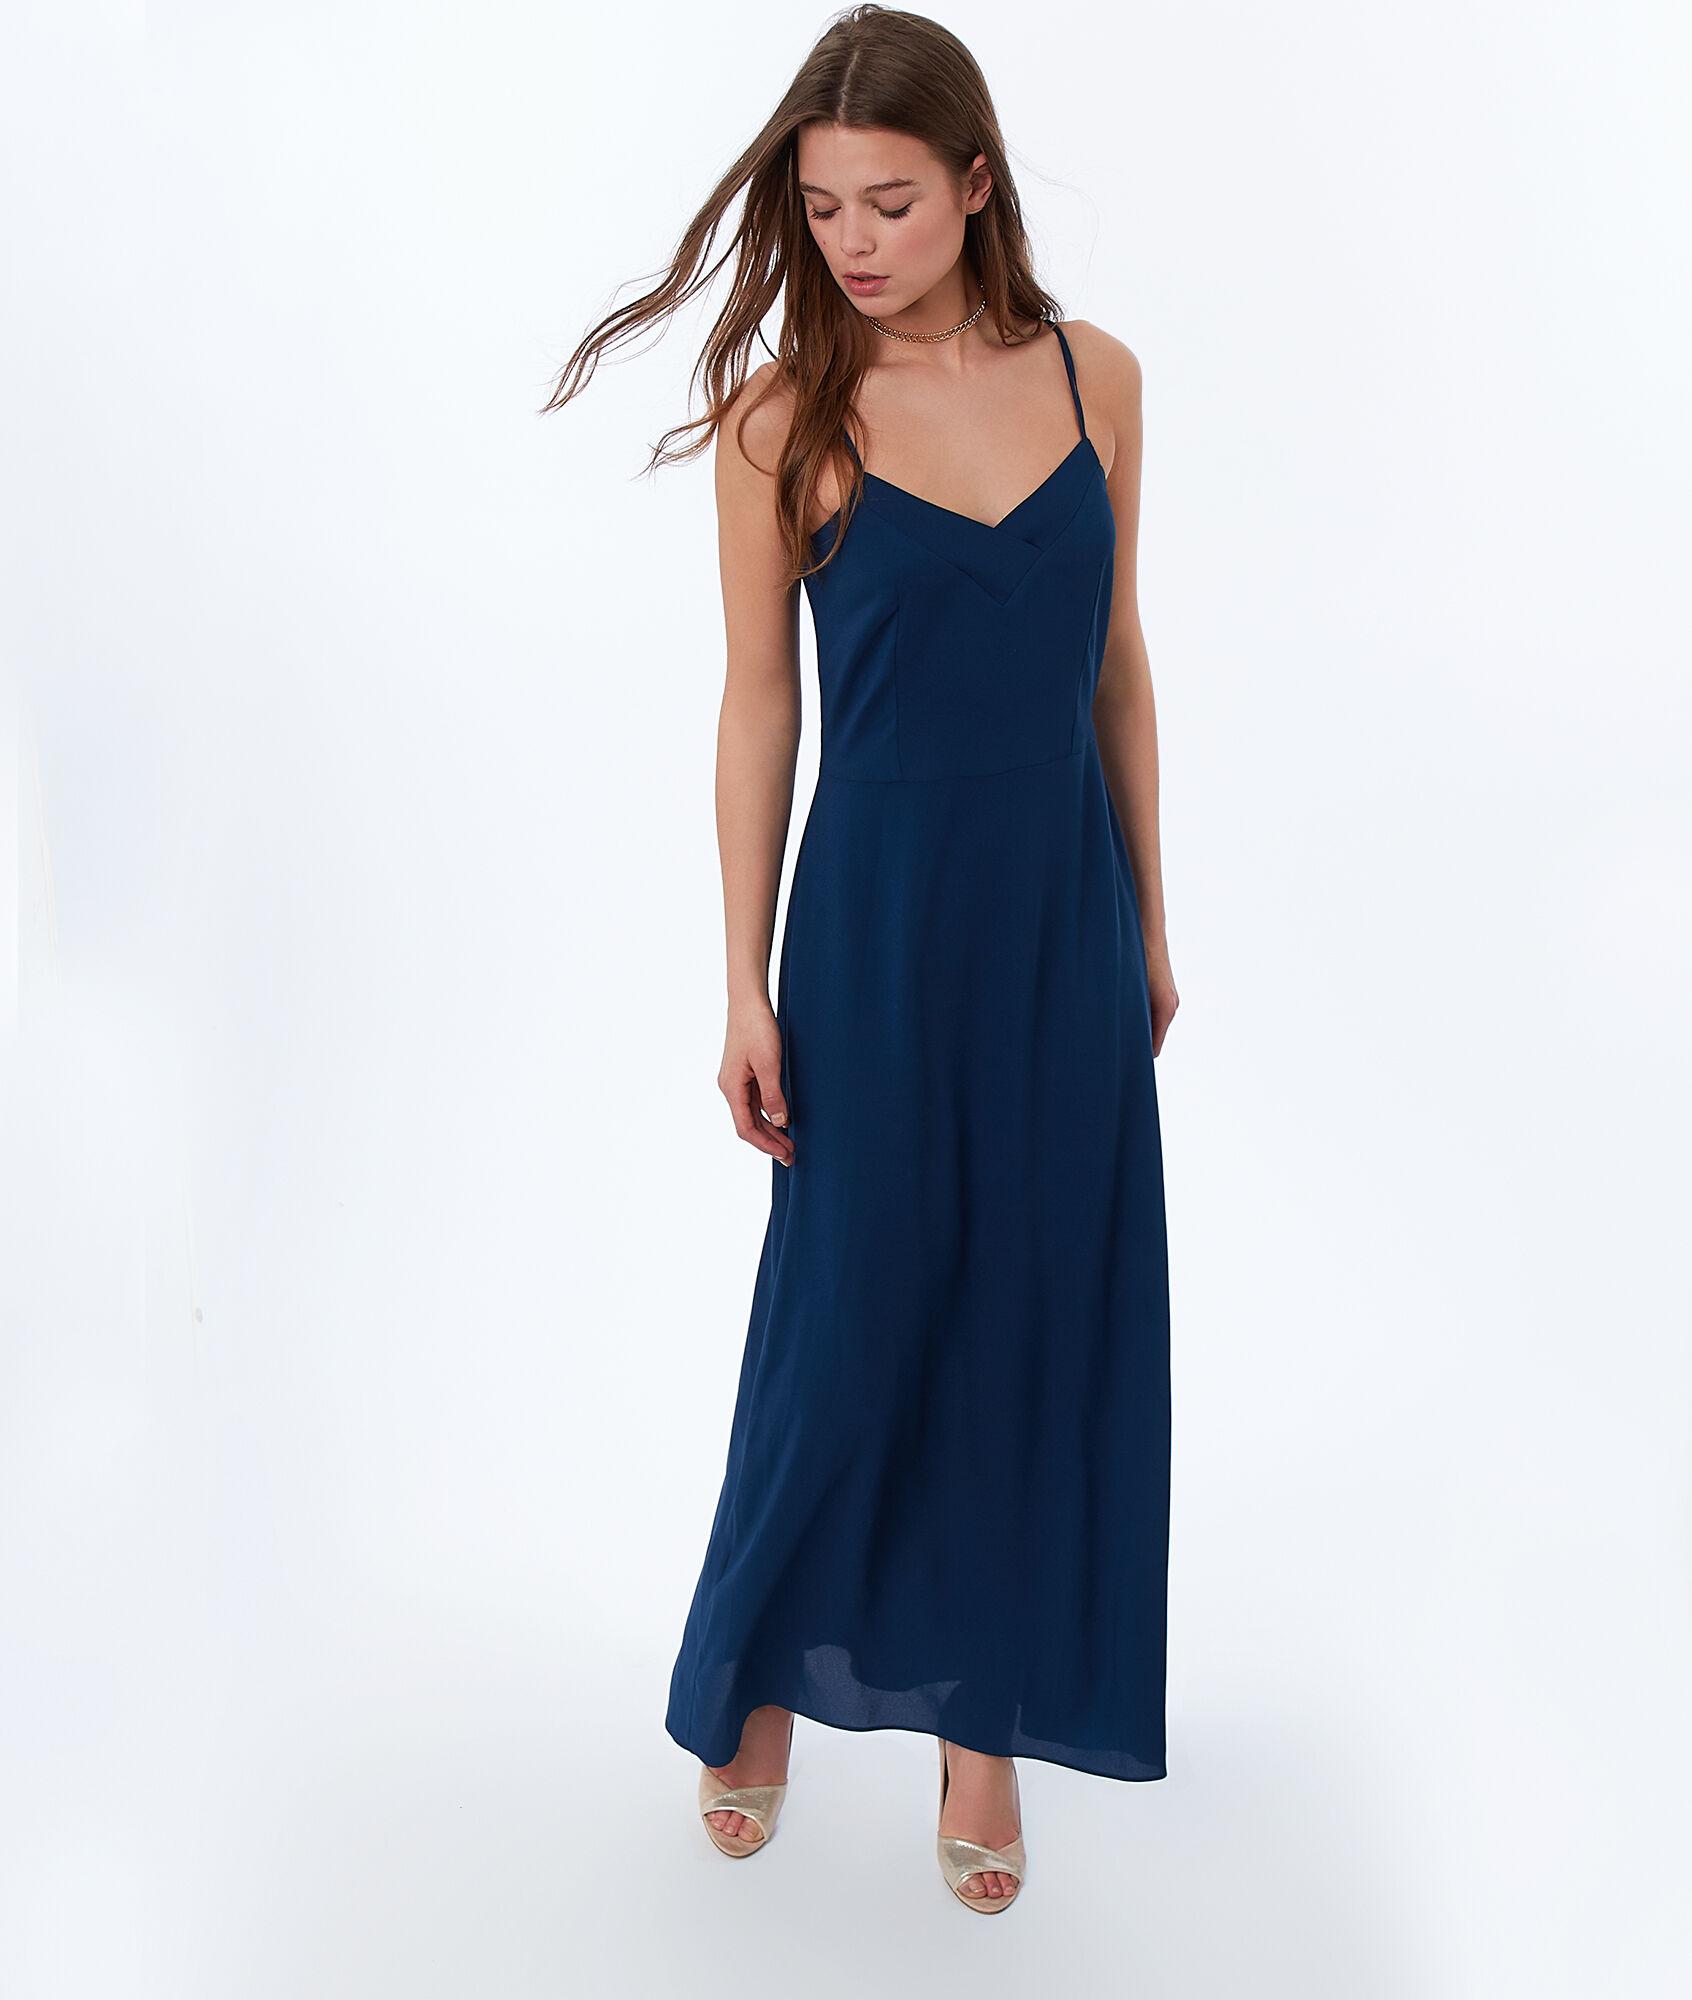 Robe longue bleu marine 123